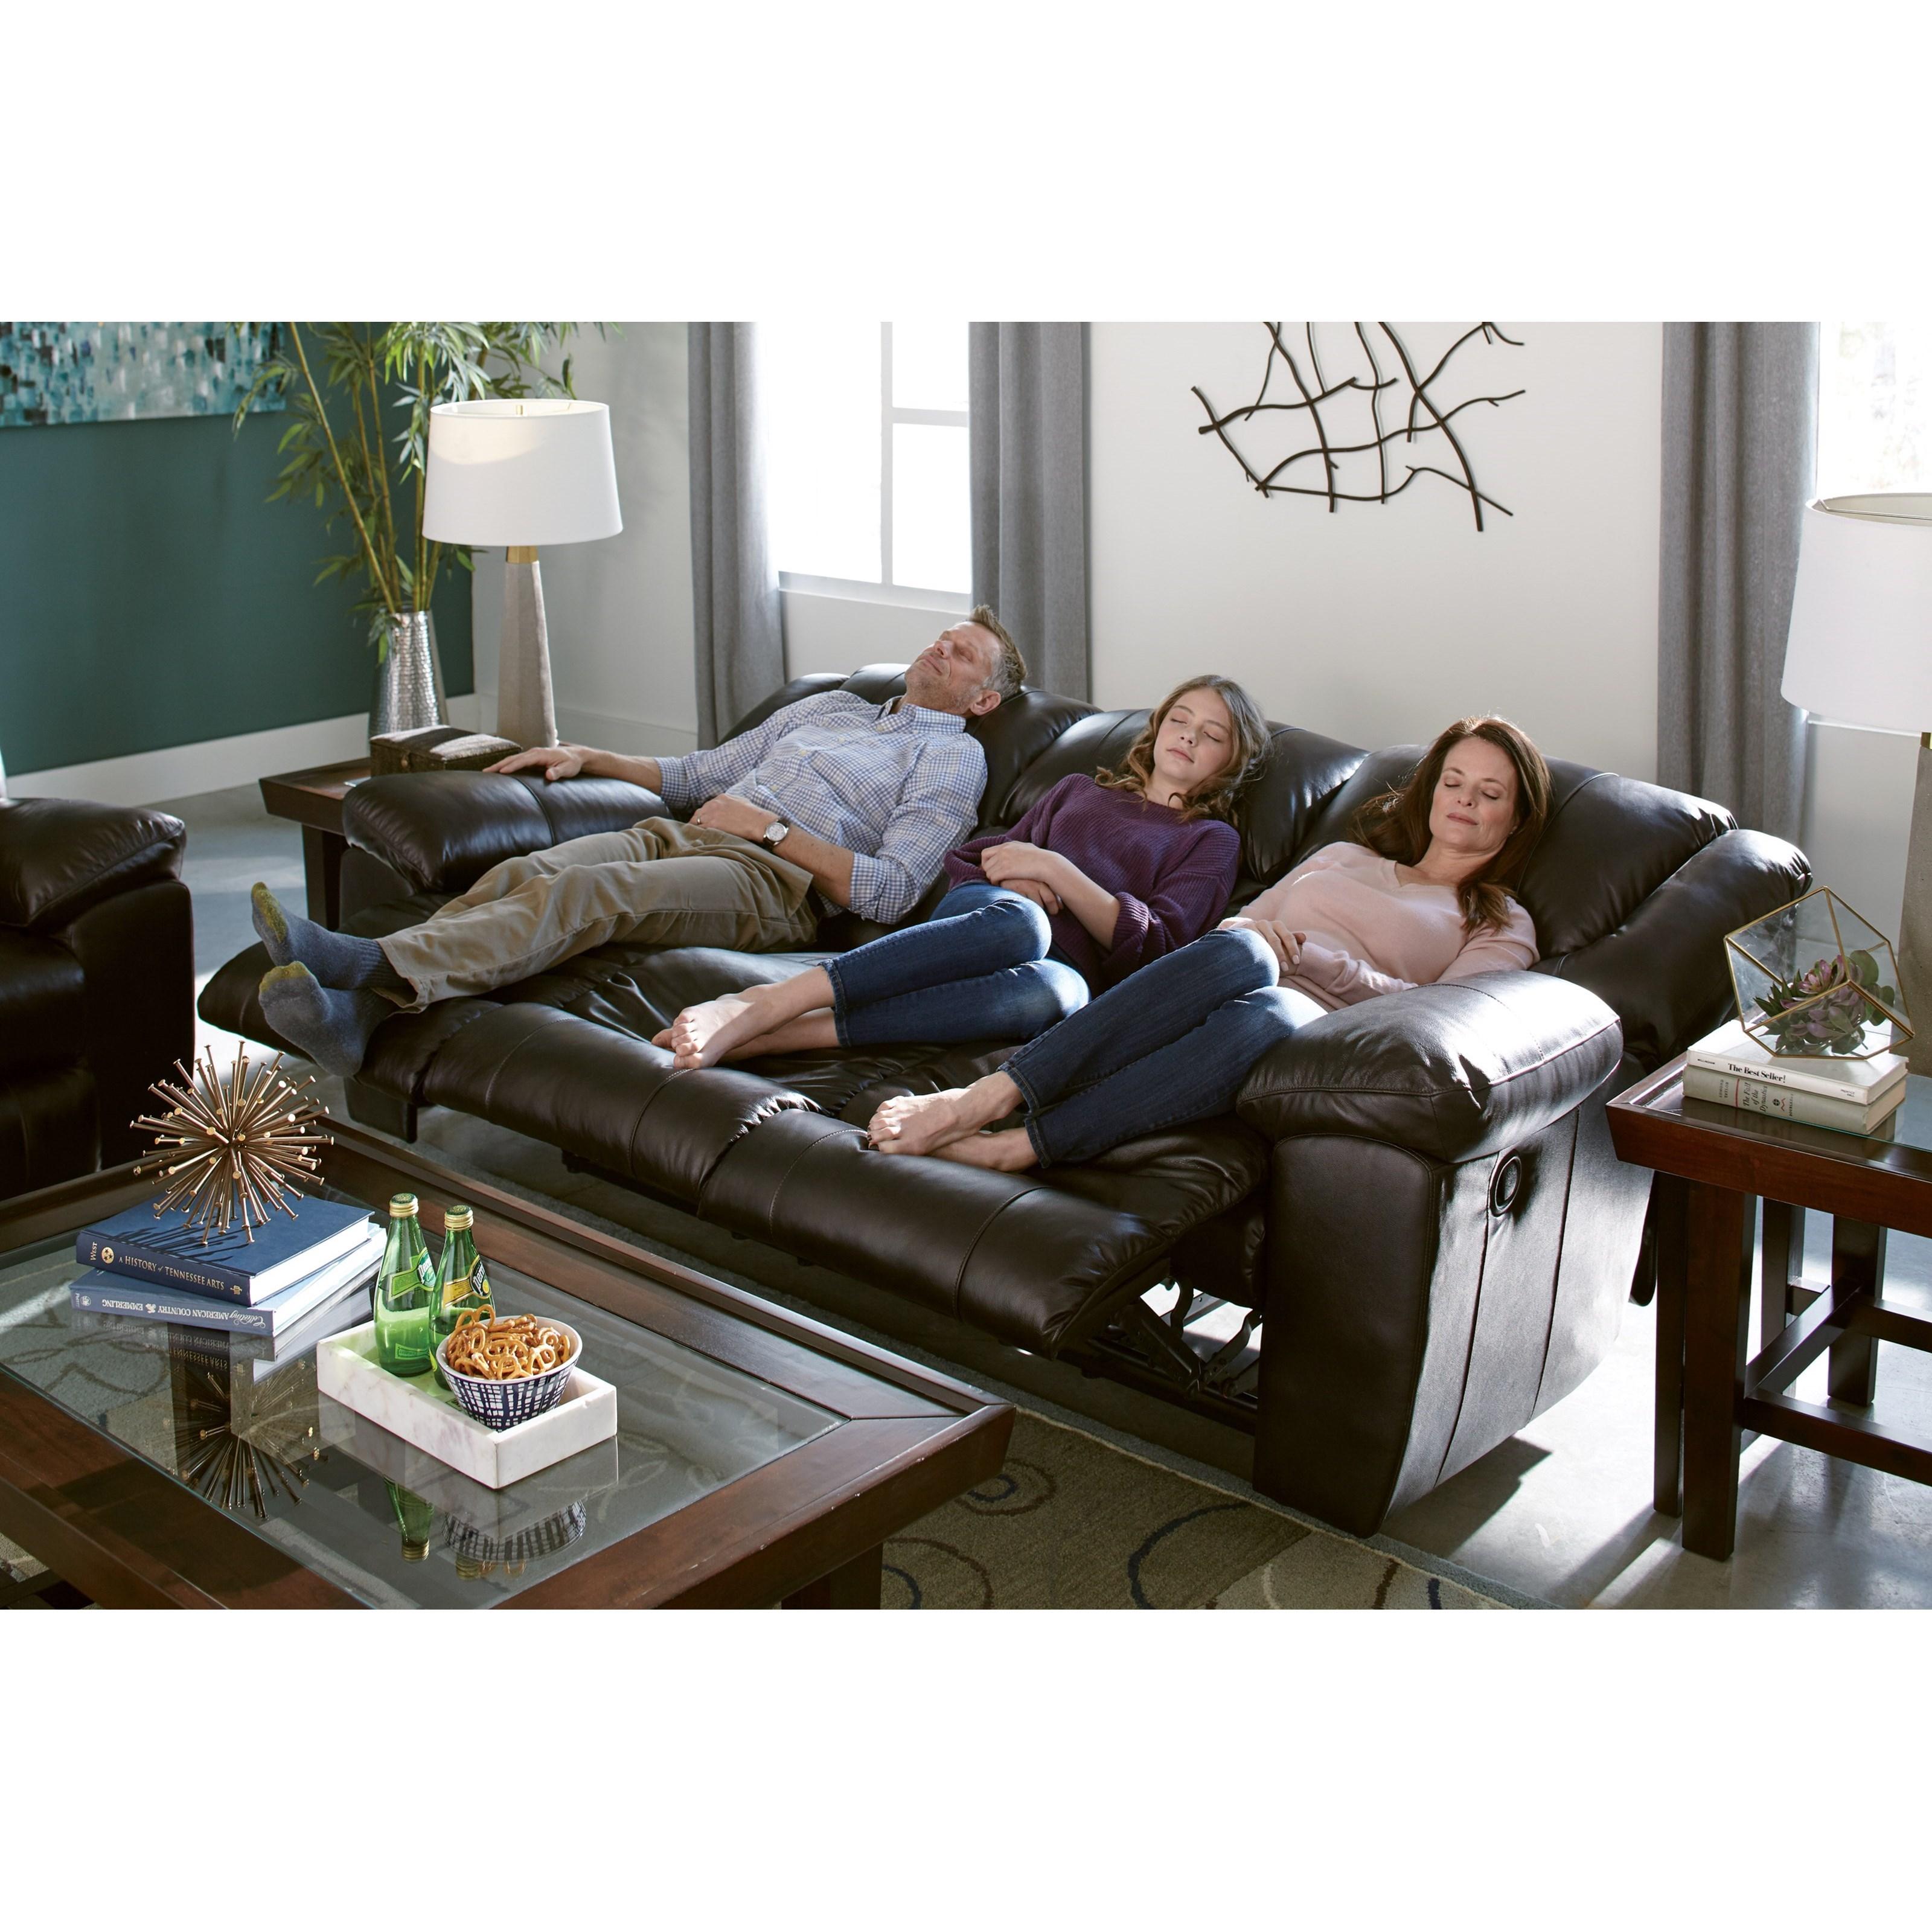 Catnapper Transformer Ii Ultimate Power Reclining Sofa